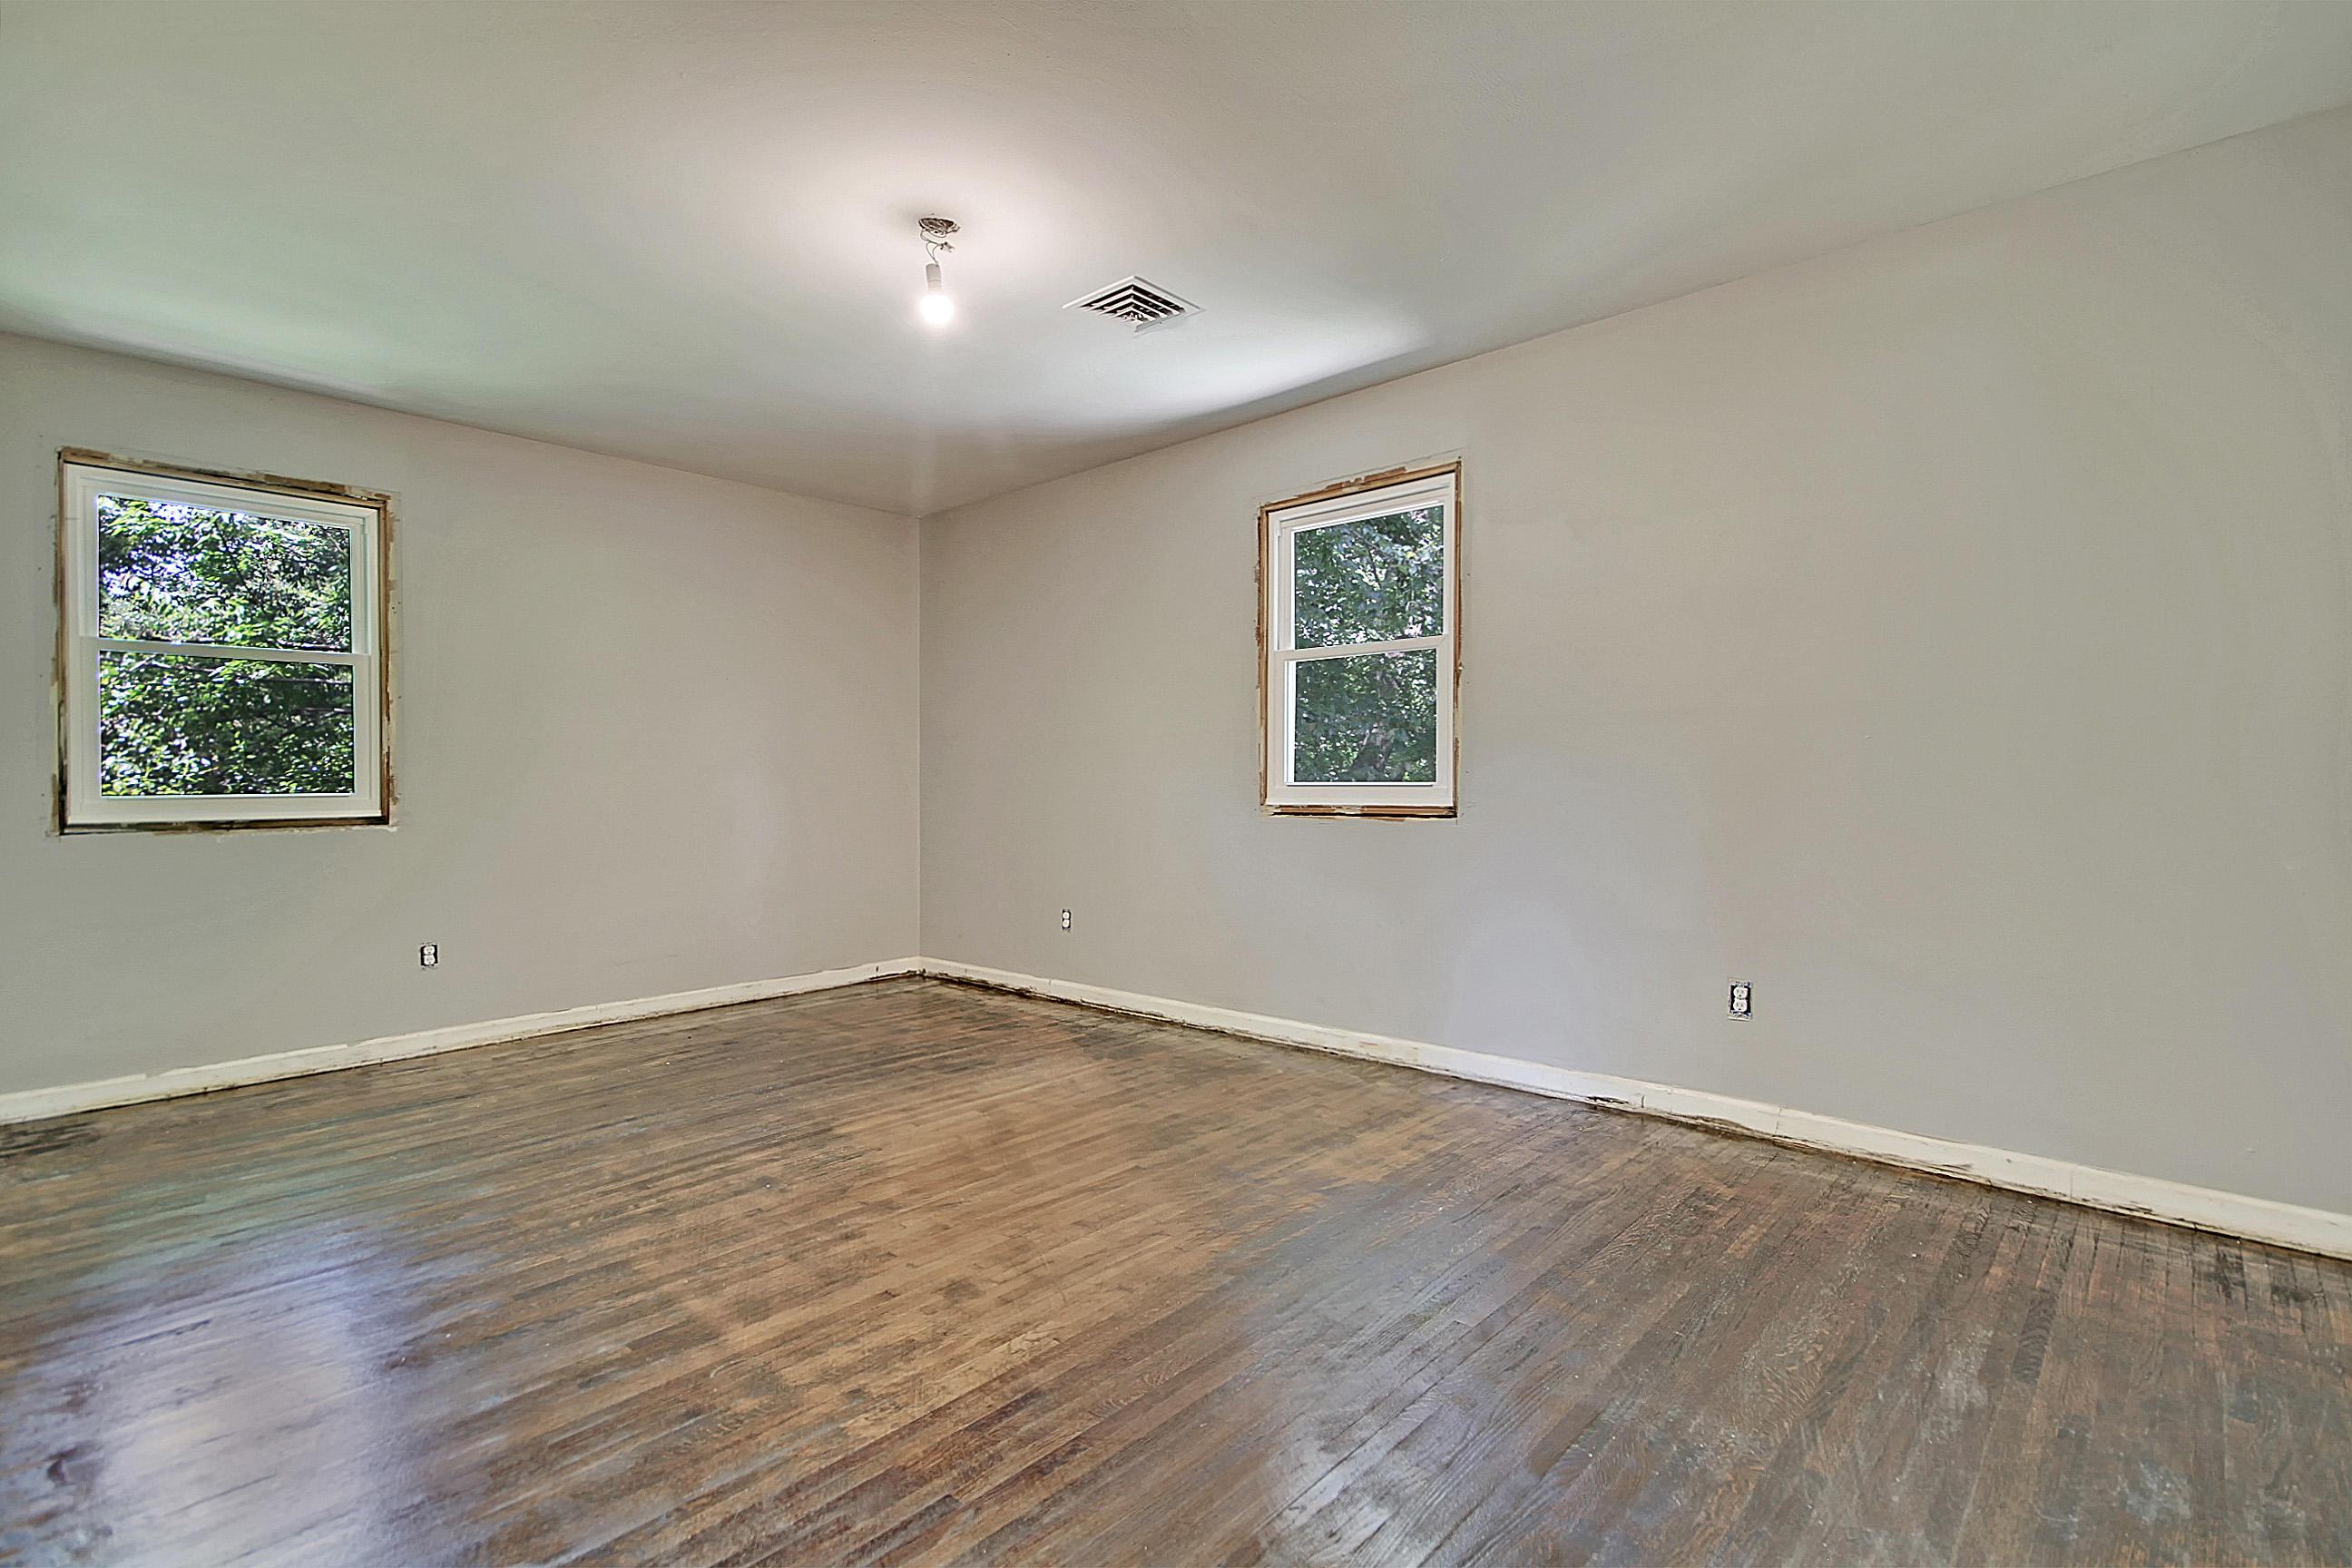 Northbridge Terrace Homes For Sale - 1094 Northbridge, Charleston, SC - 19